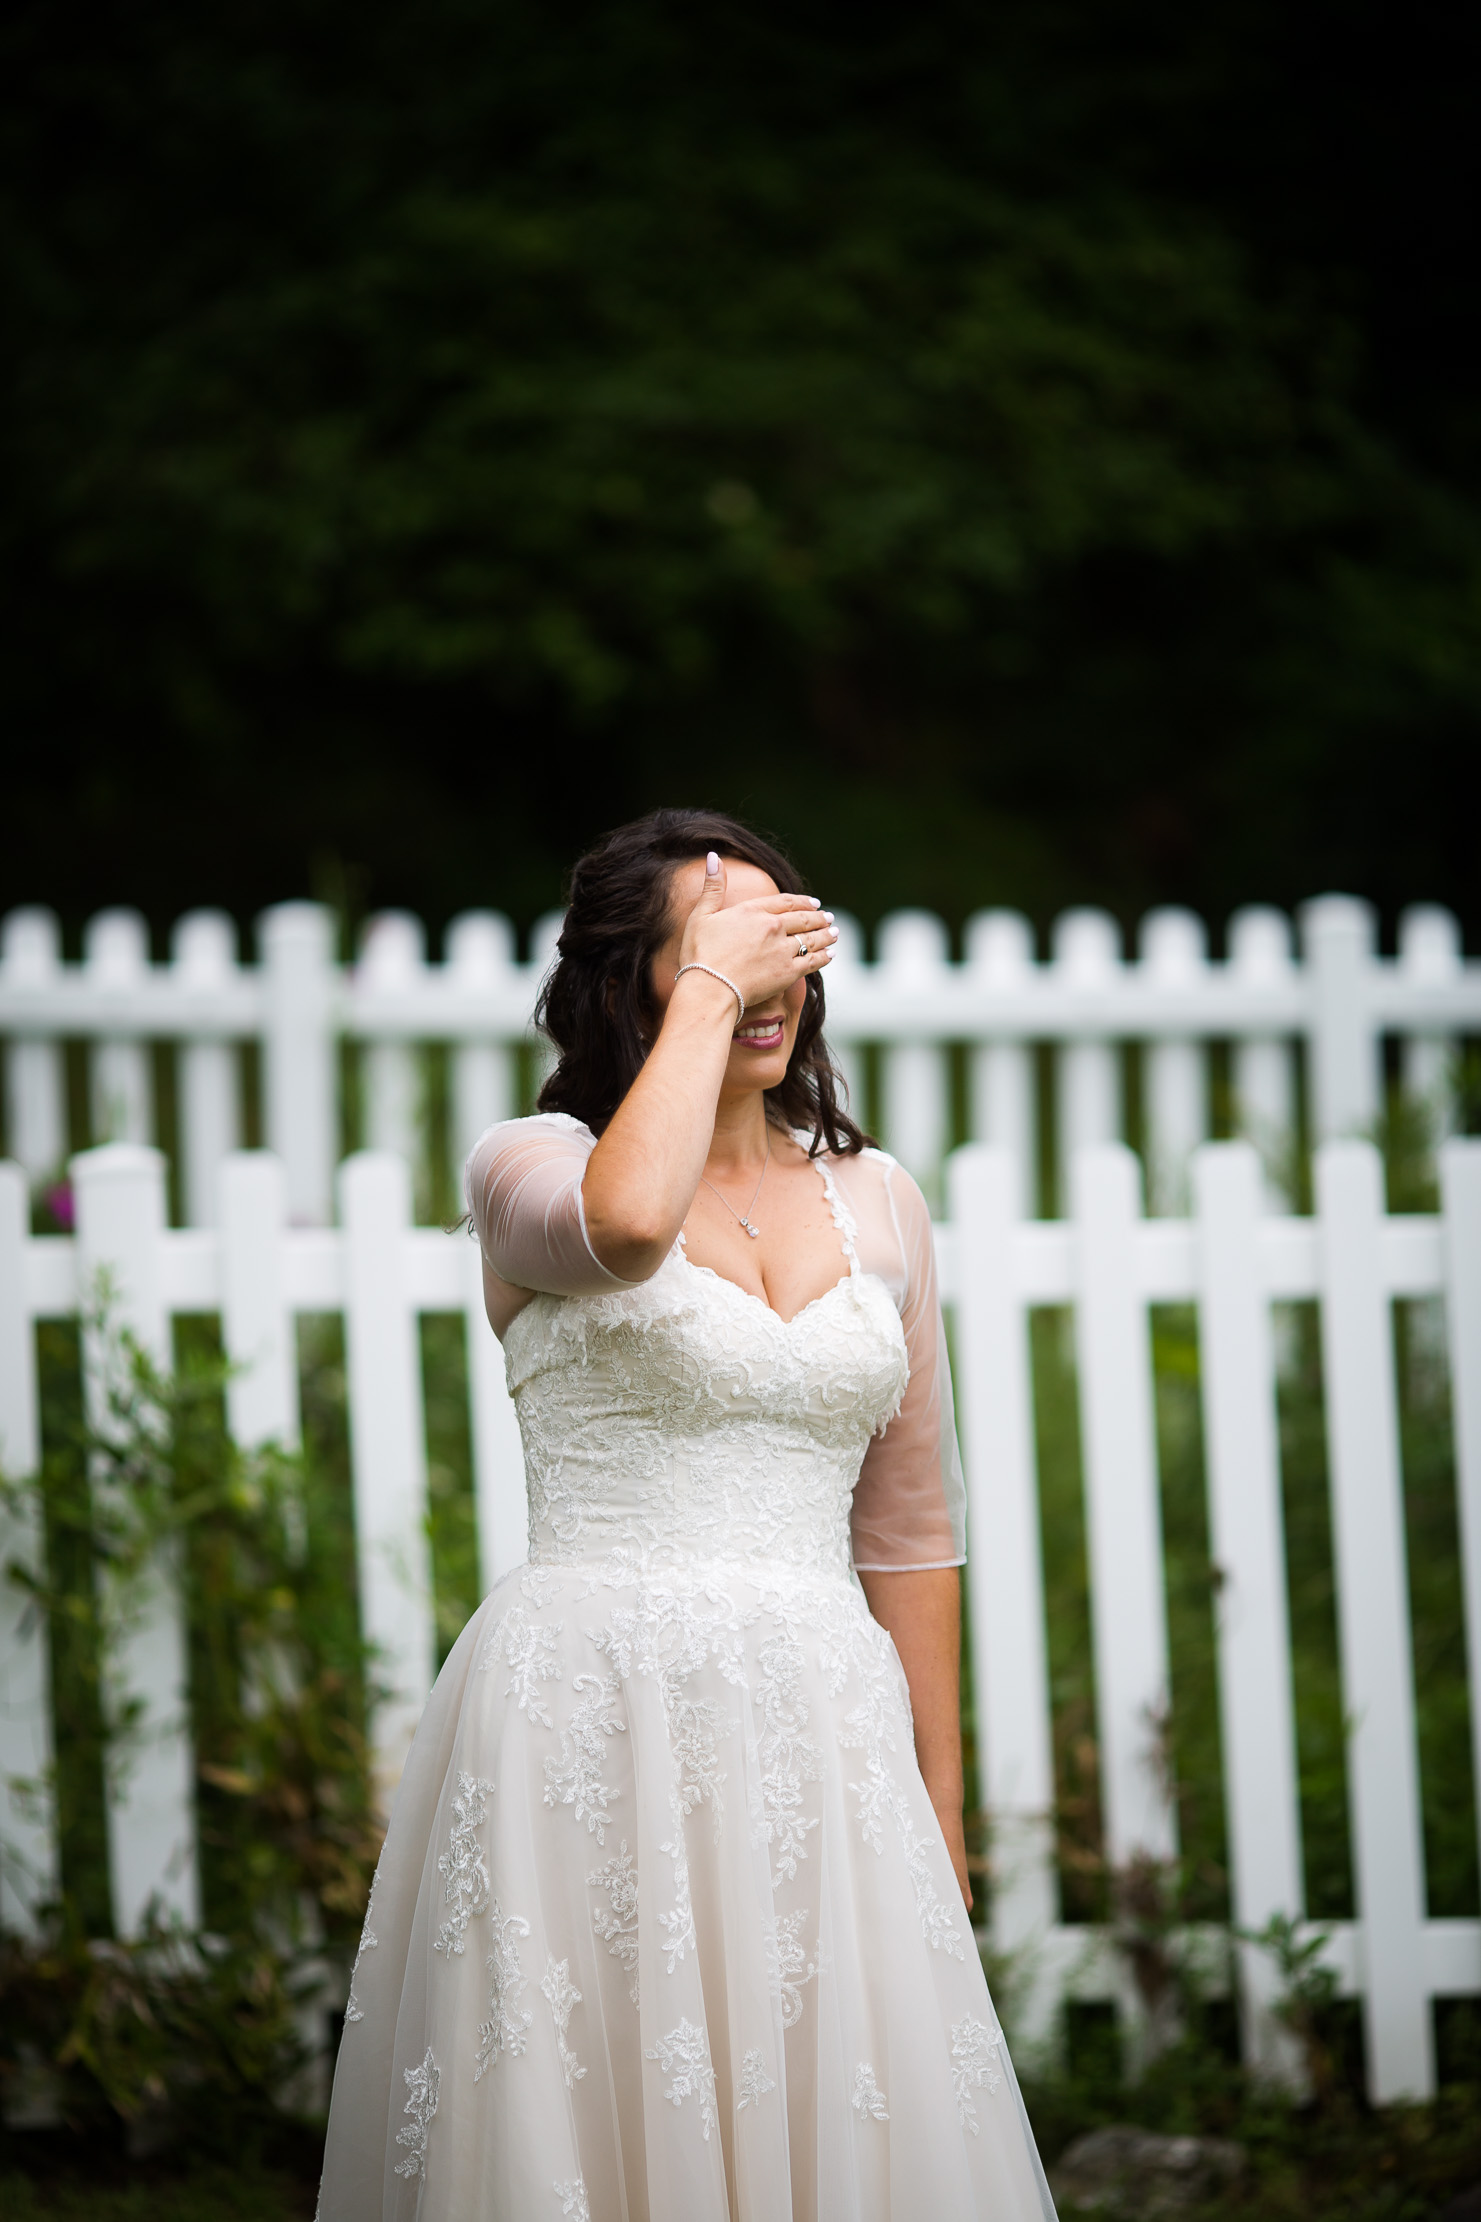 Wings-Castle-Millbrook-NY-Upstate-Wedding-Photographer-1029.jpg